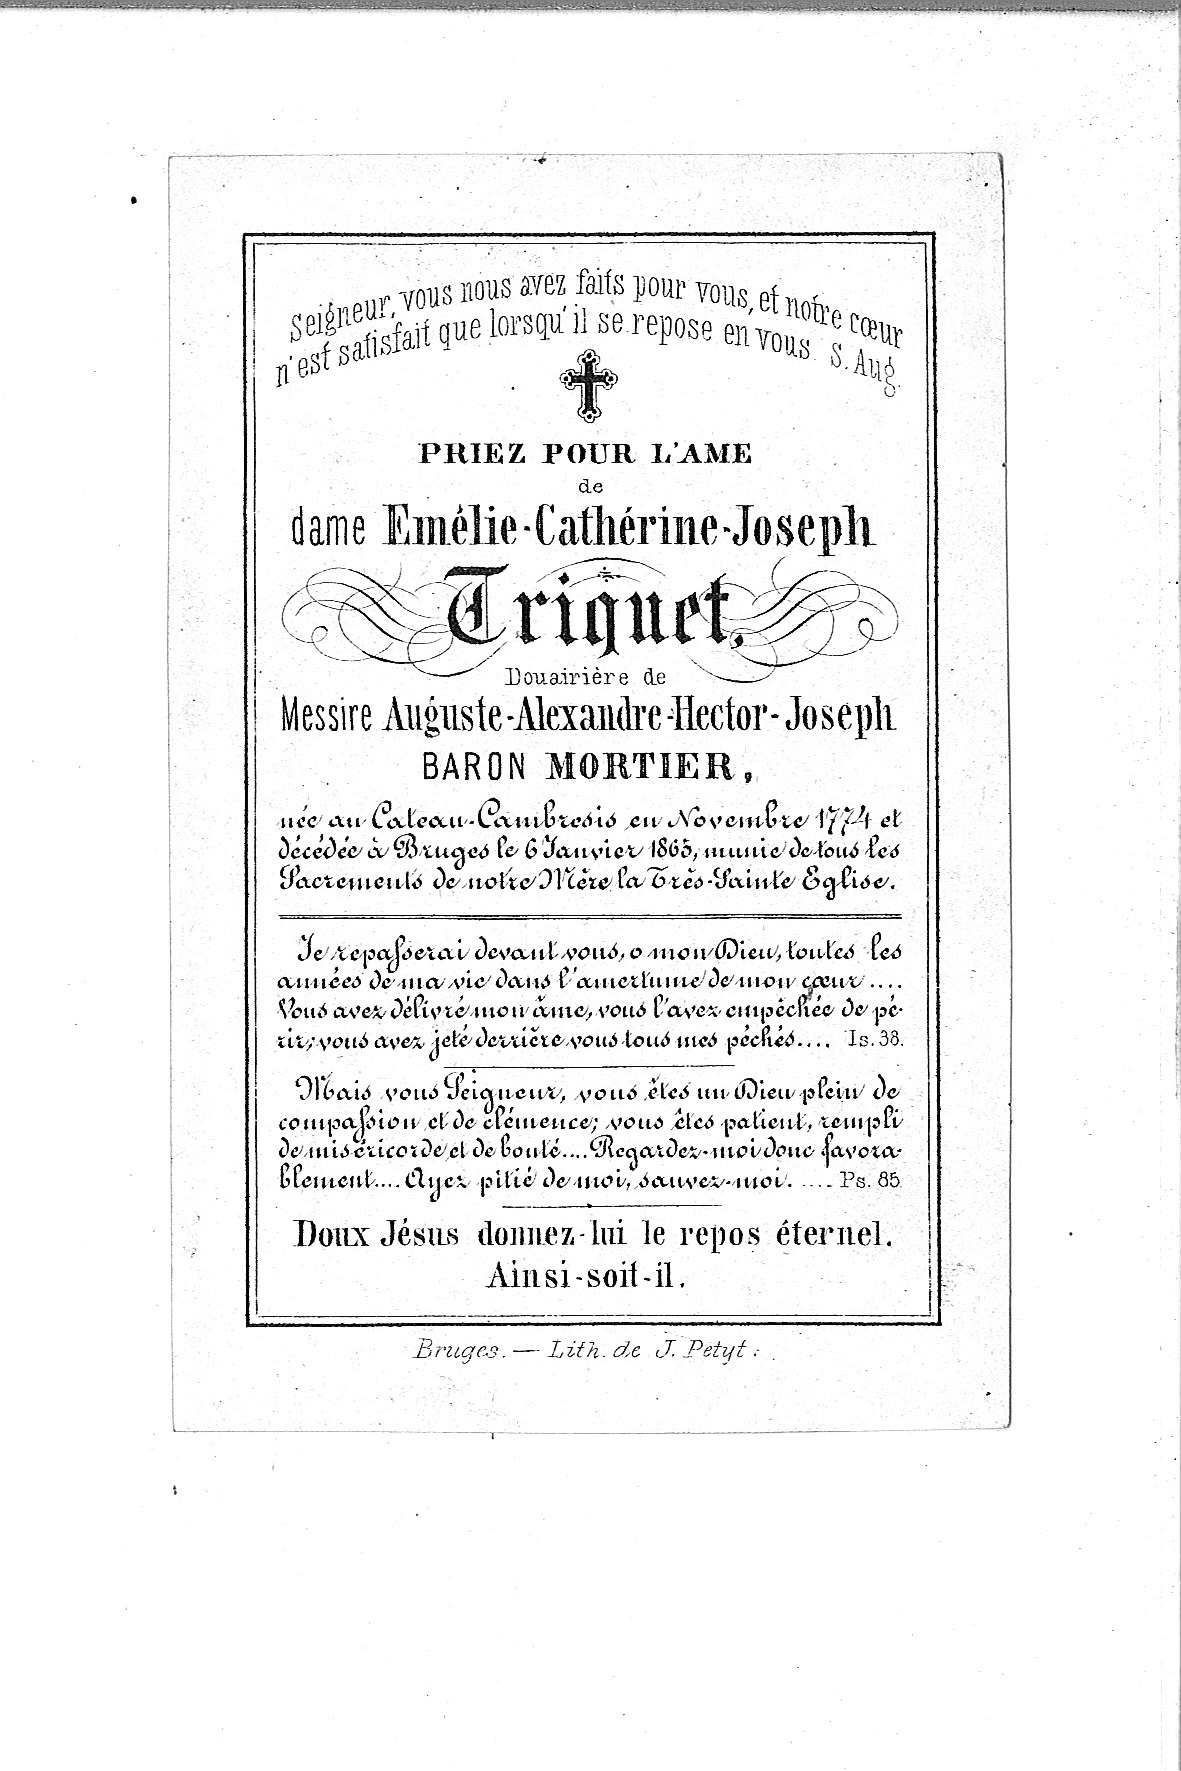 Emelie-Cathérine-Joseph(1865)20120621134457_00124.jpg